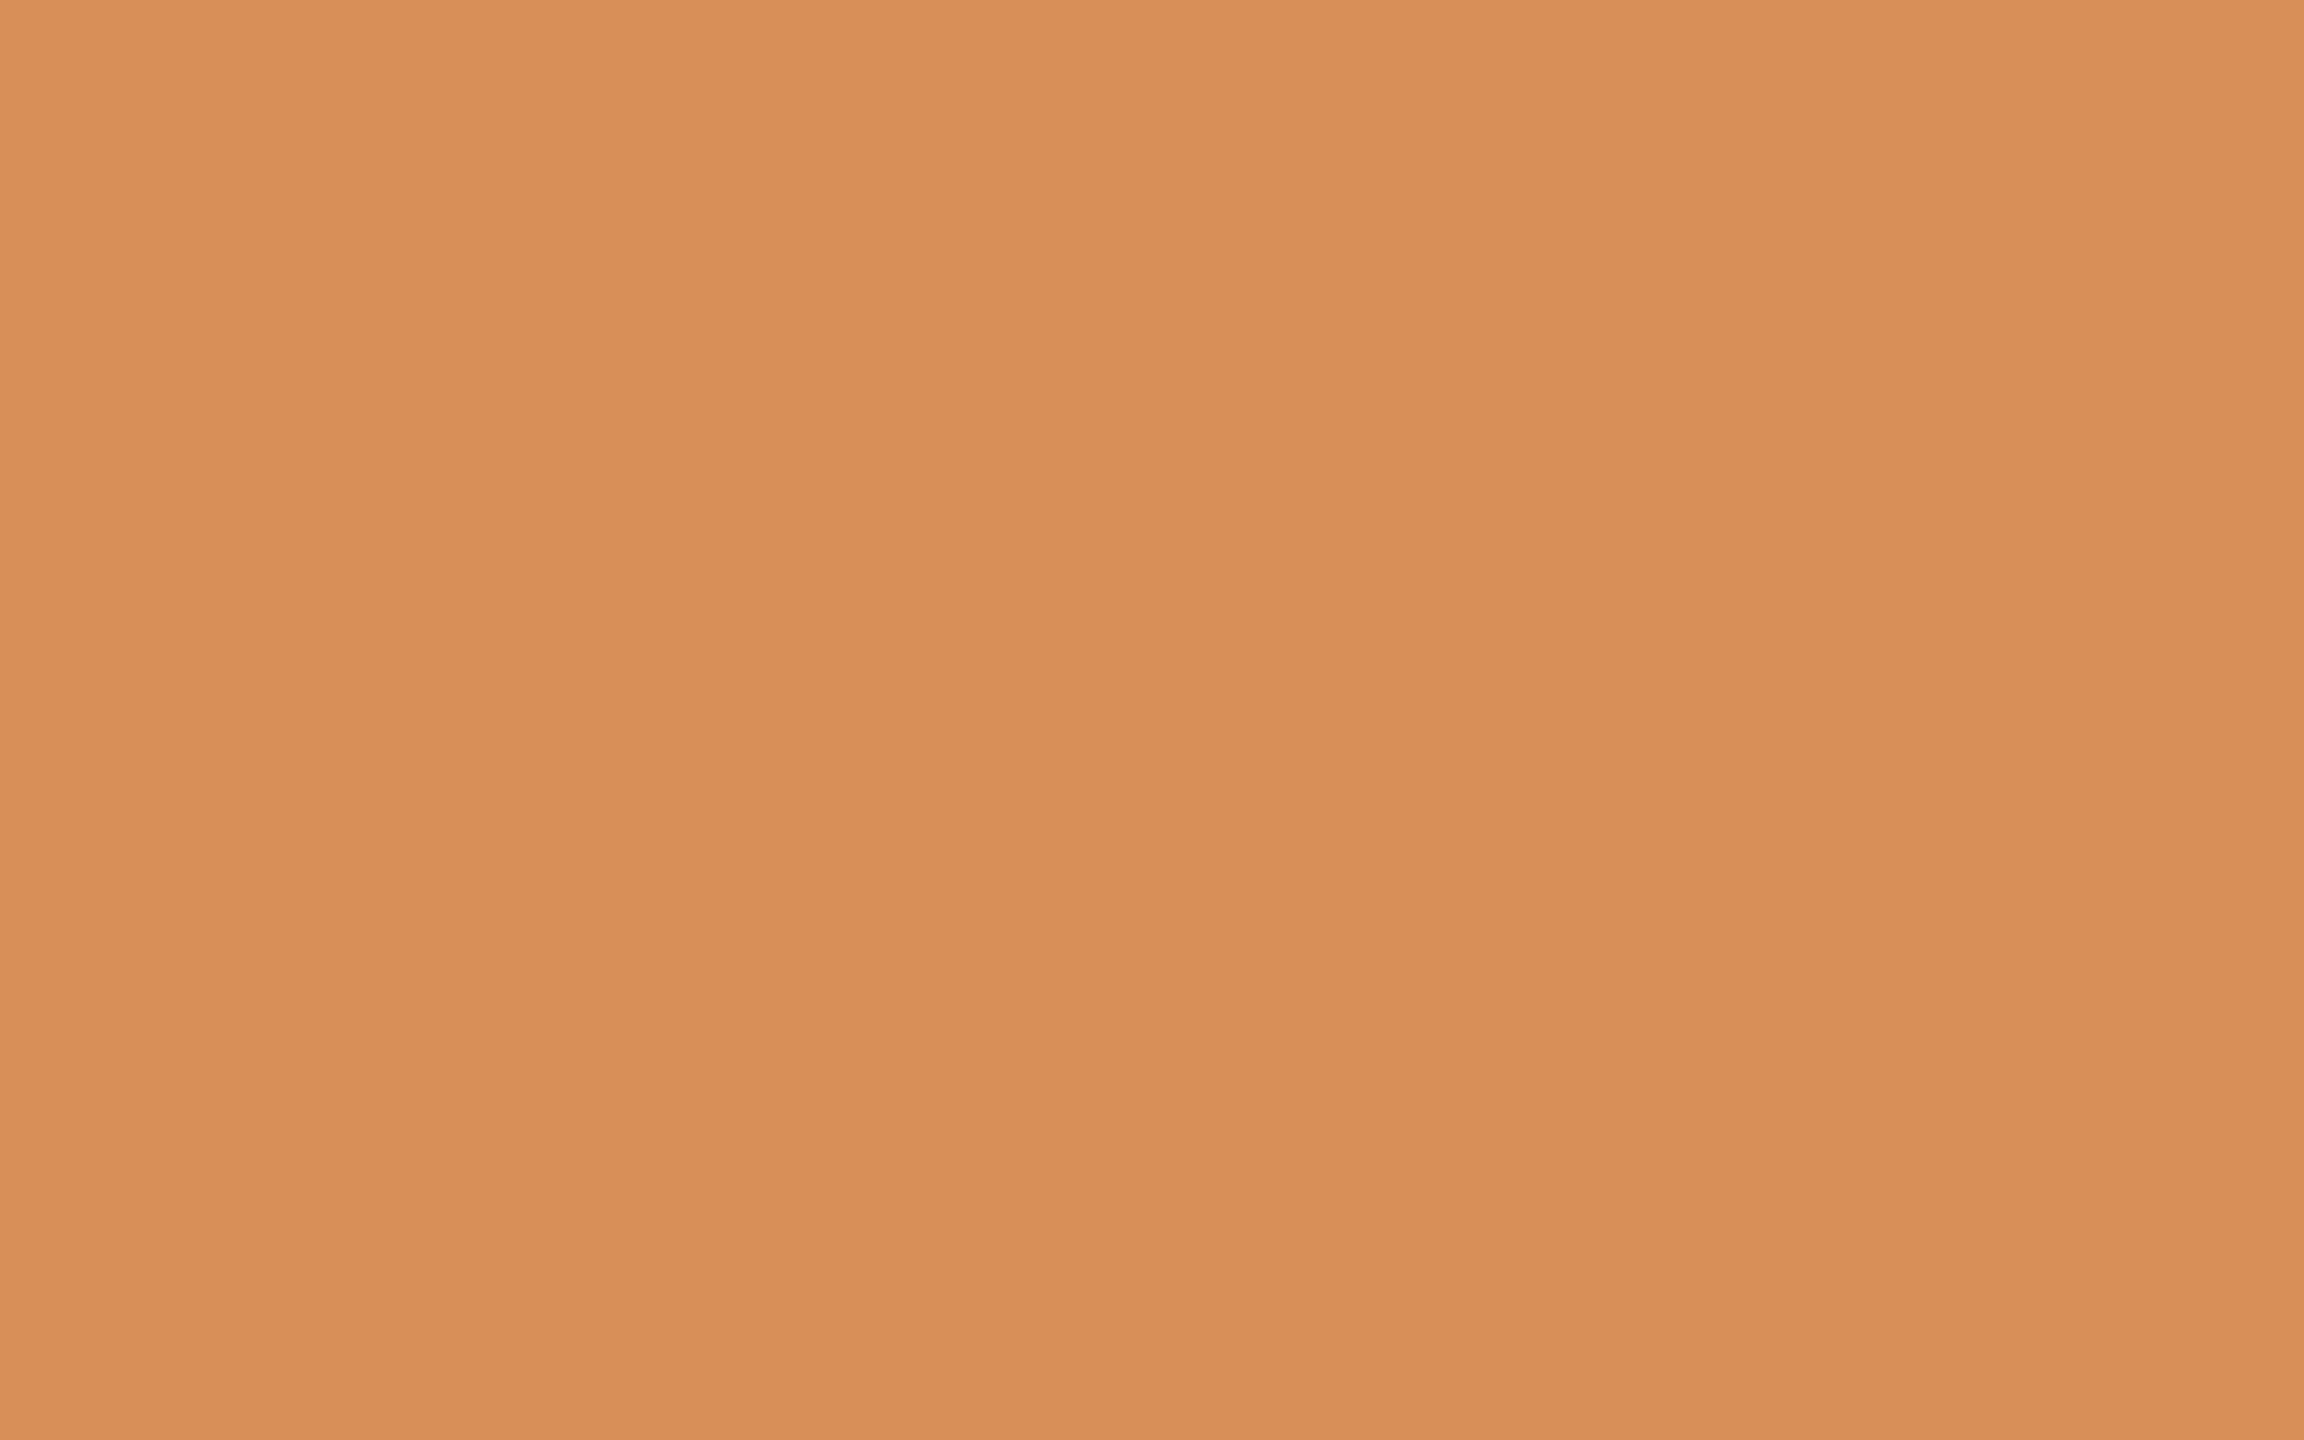 2304x1440 Persian Orange Solid Color Background